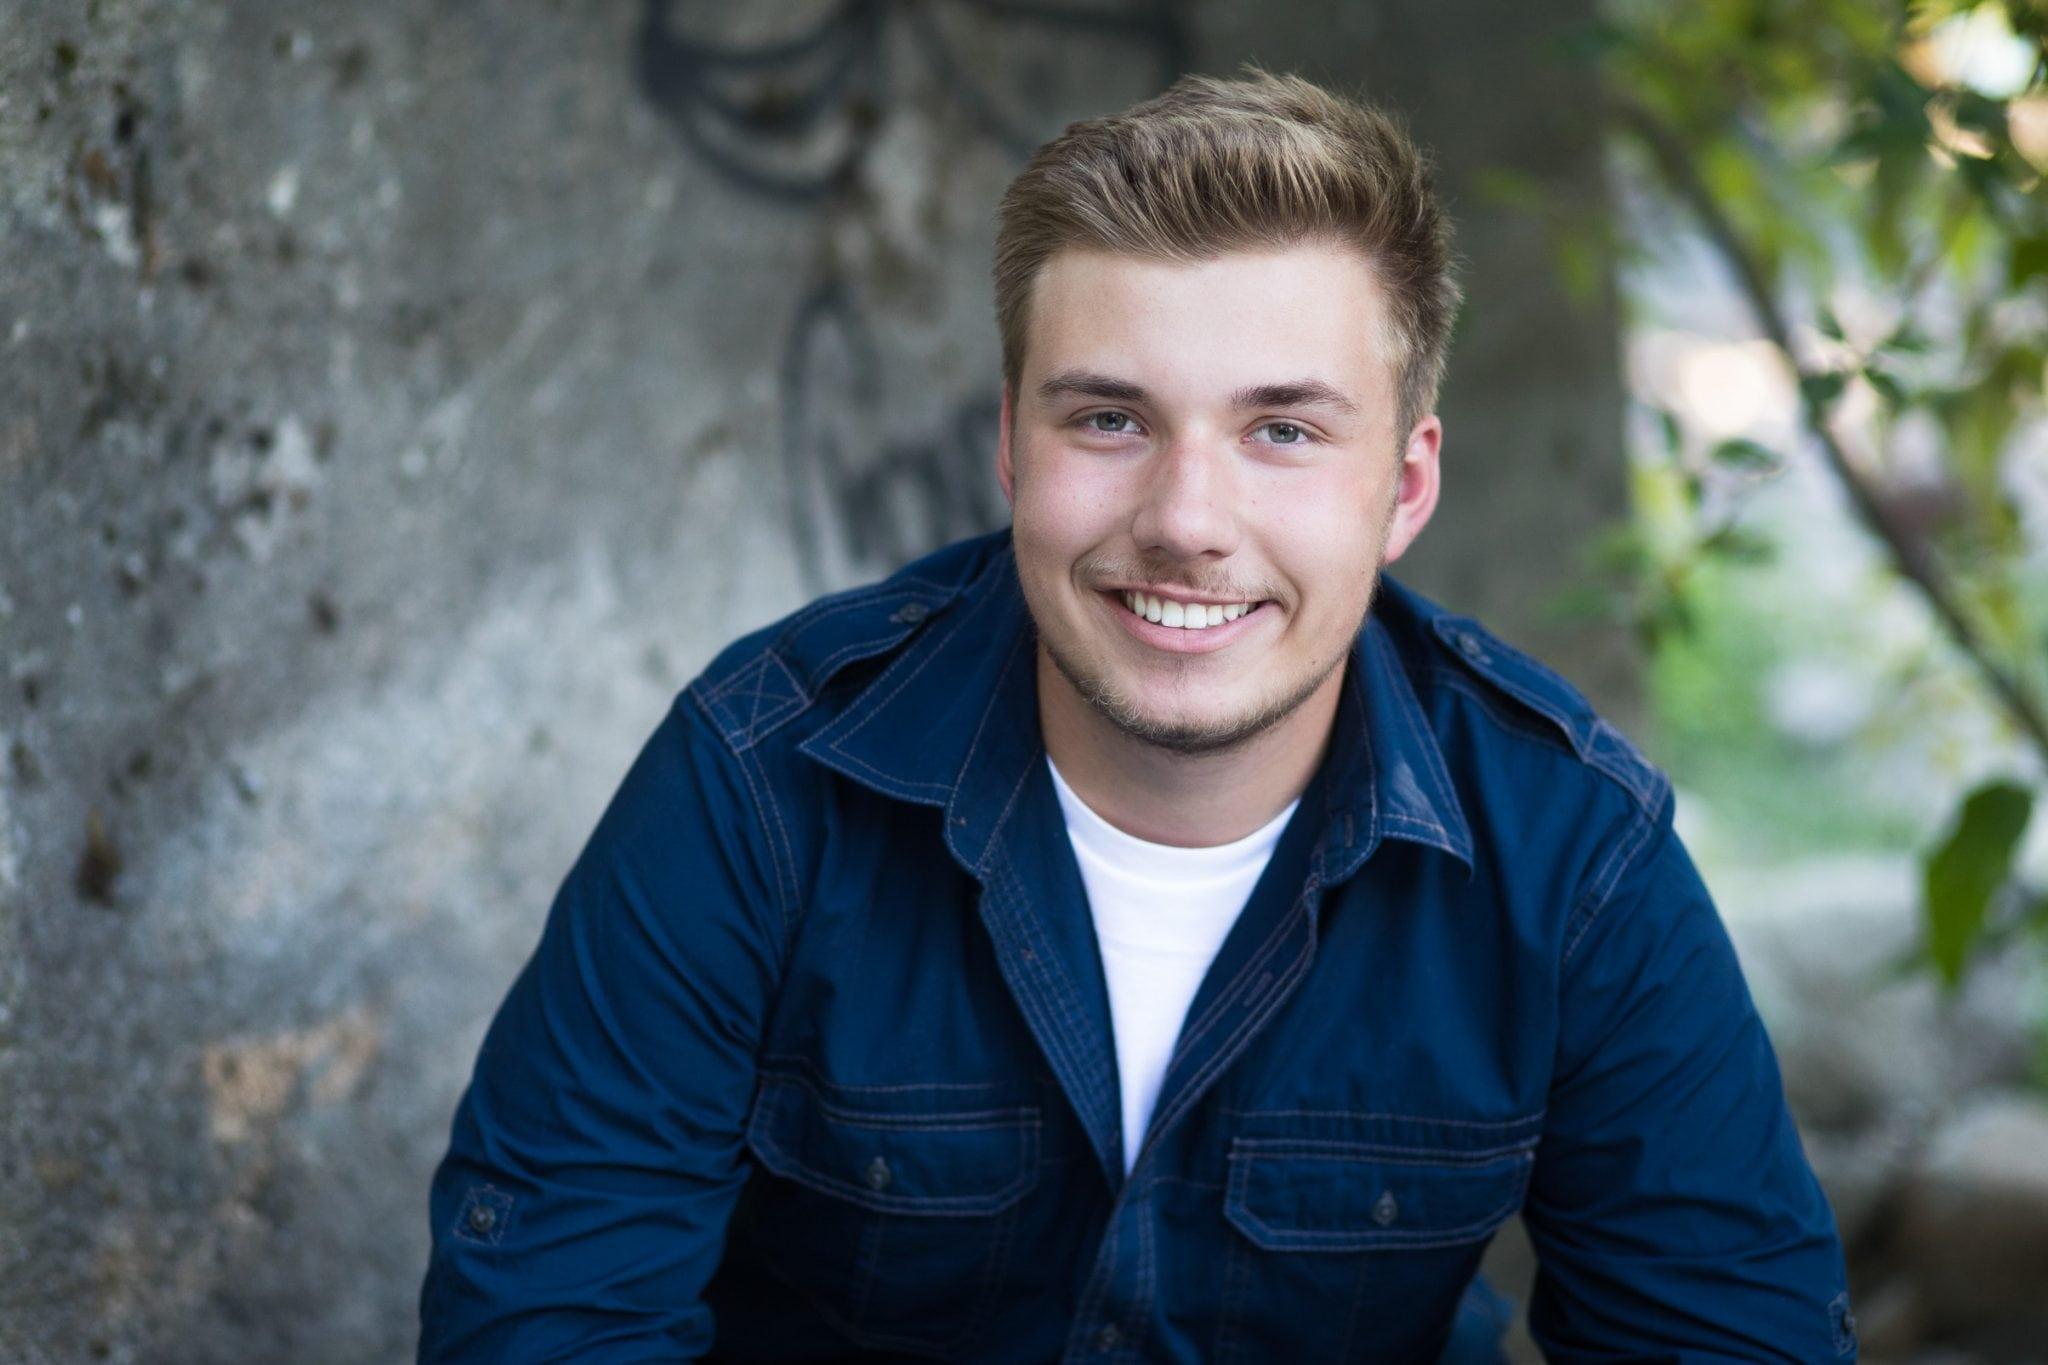 Spokane senior portrait photographer